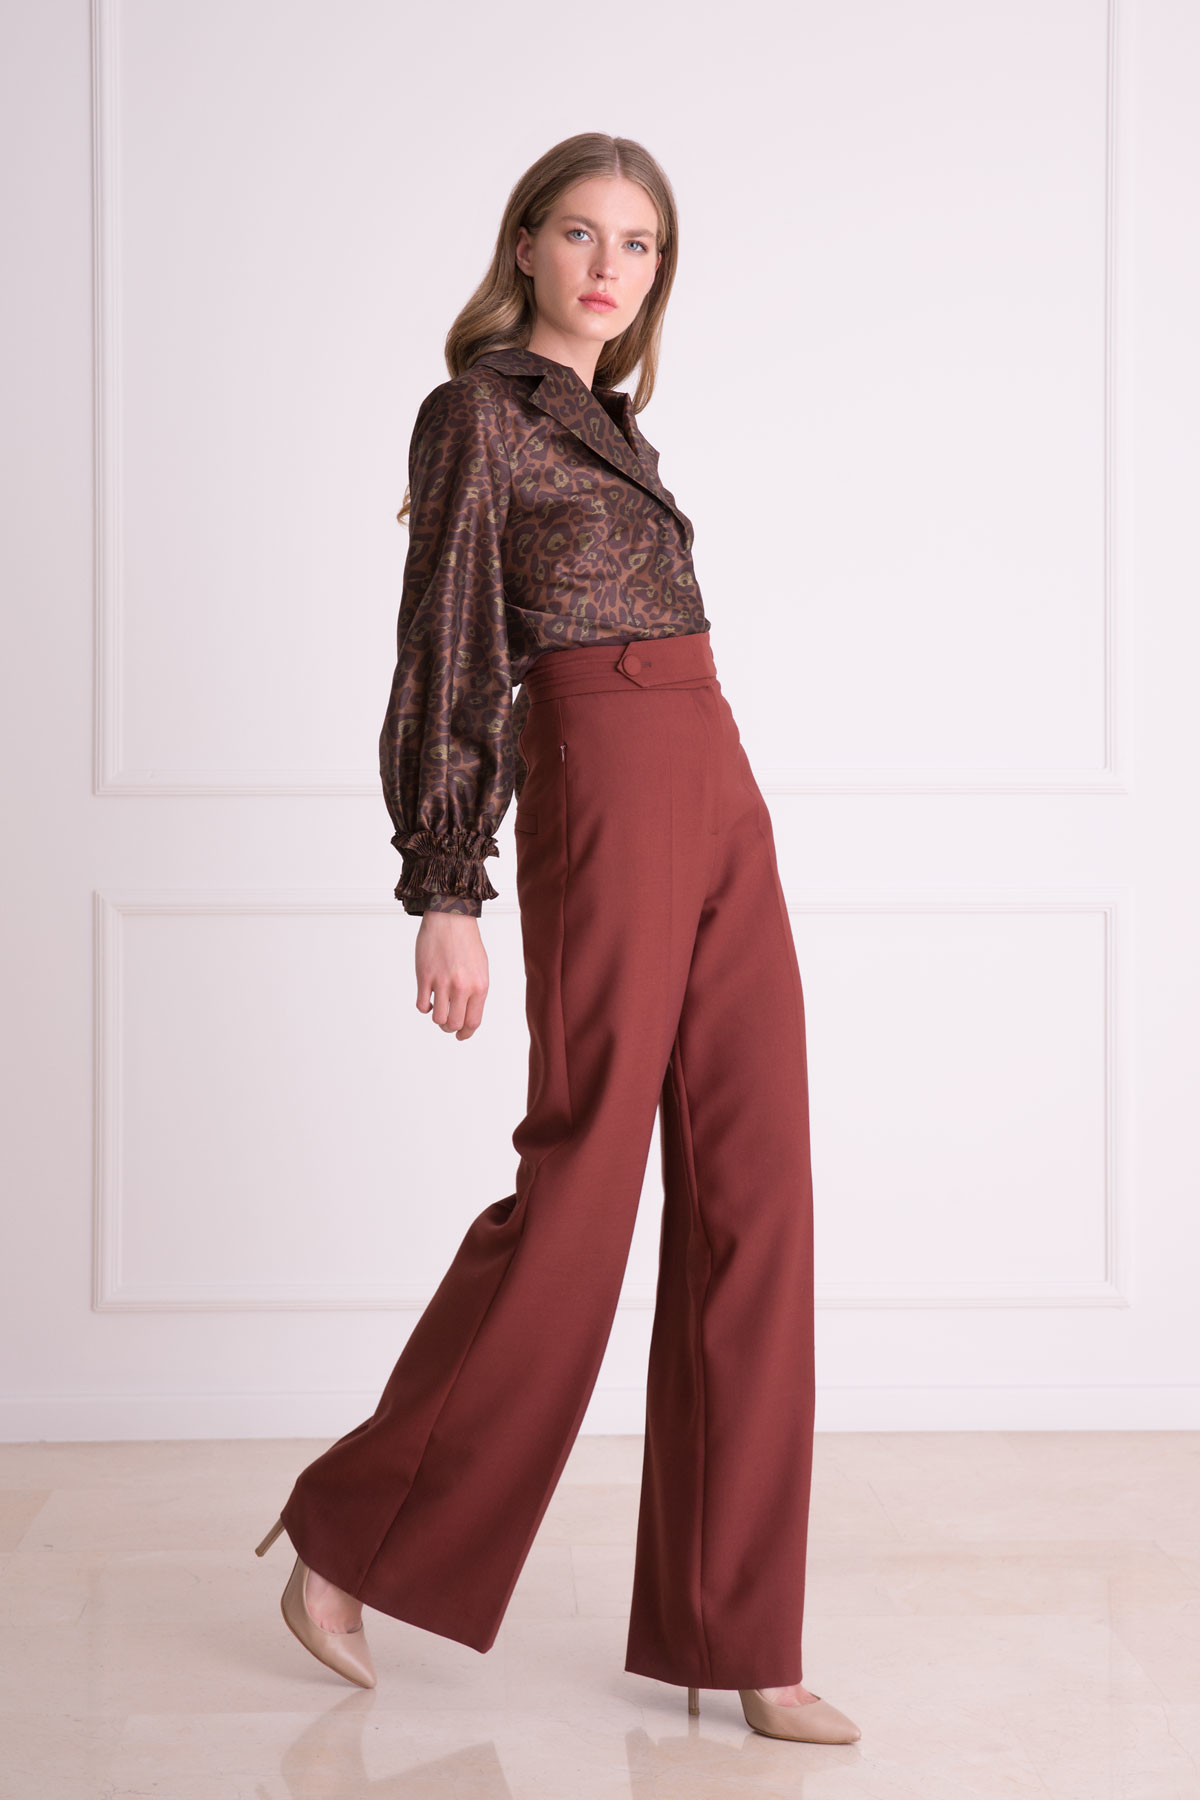 Bel Kemer Detaylı Kiremit Rengi Bol Paça Pantolon